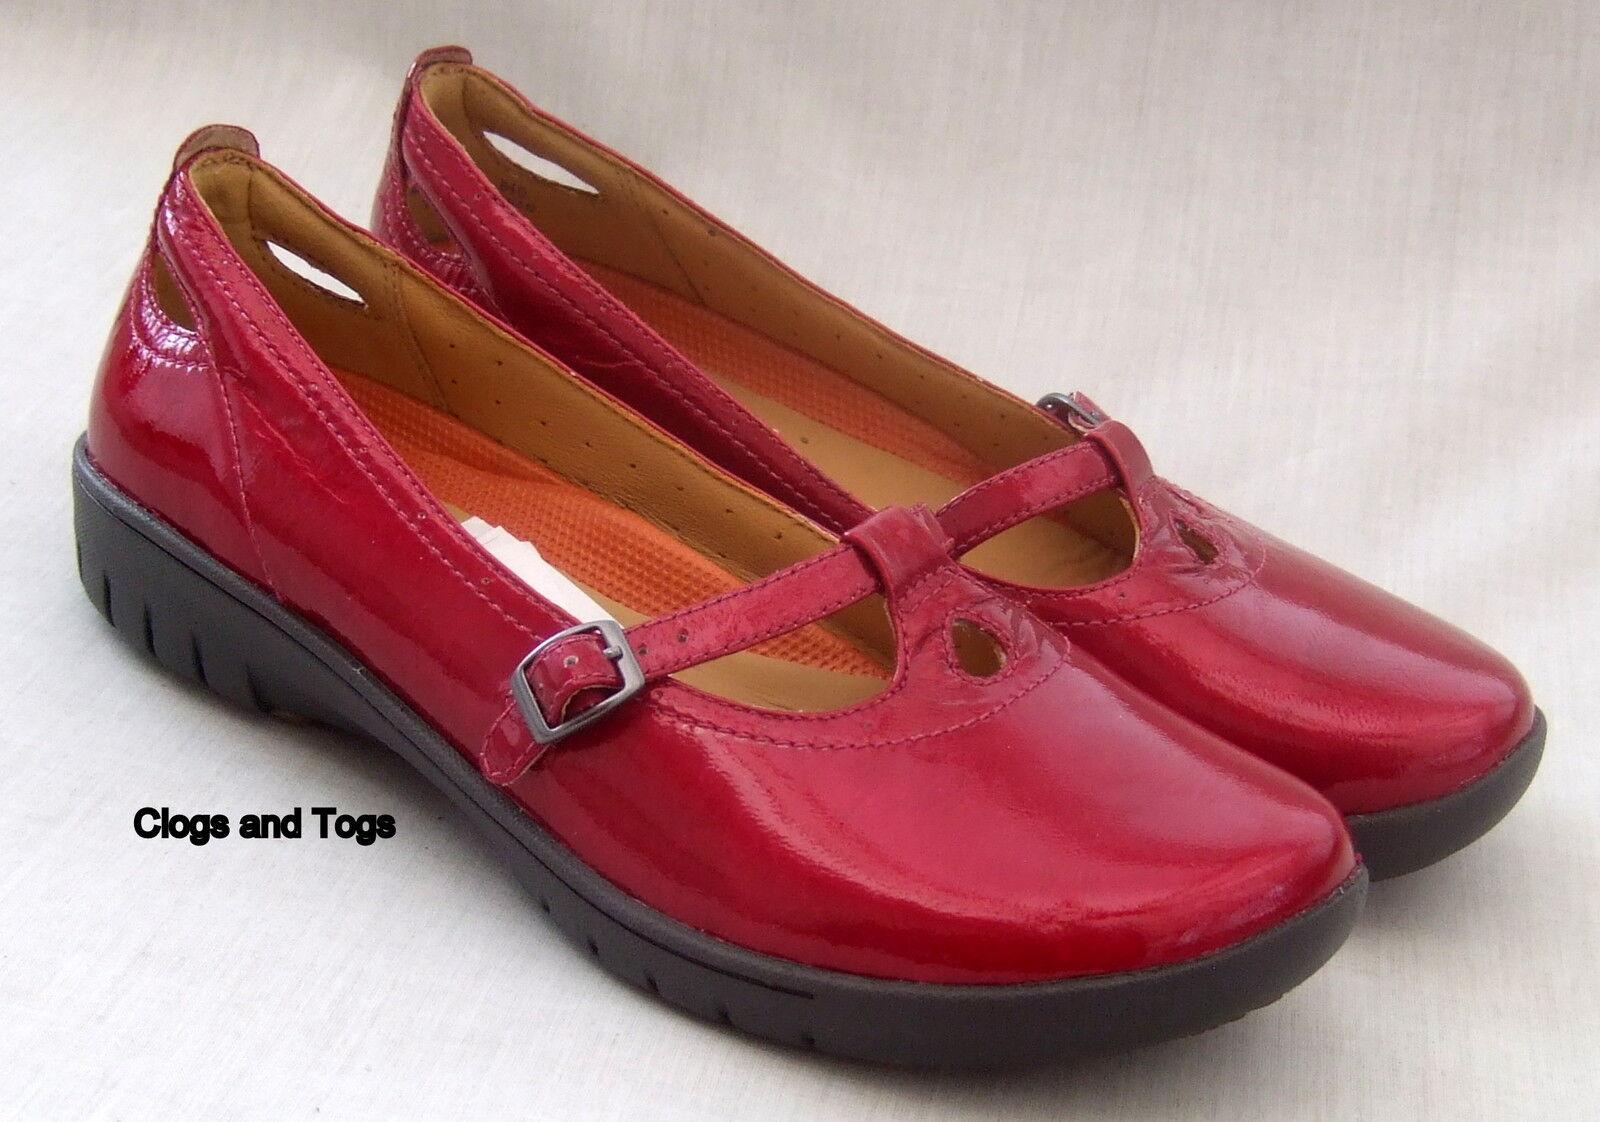 NEW CLARKS UNSTRUCTUROT RASPBERRY UN LOTTIE Damenschuhe RASPBERRY UNSTRUCTUROT PATENT Schuhe 603b99